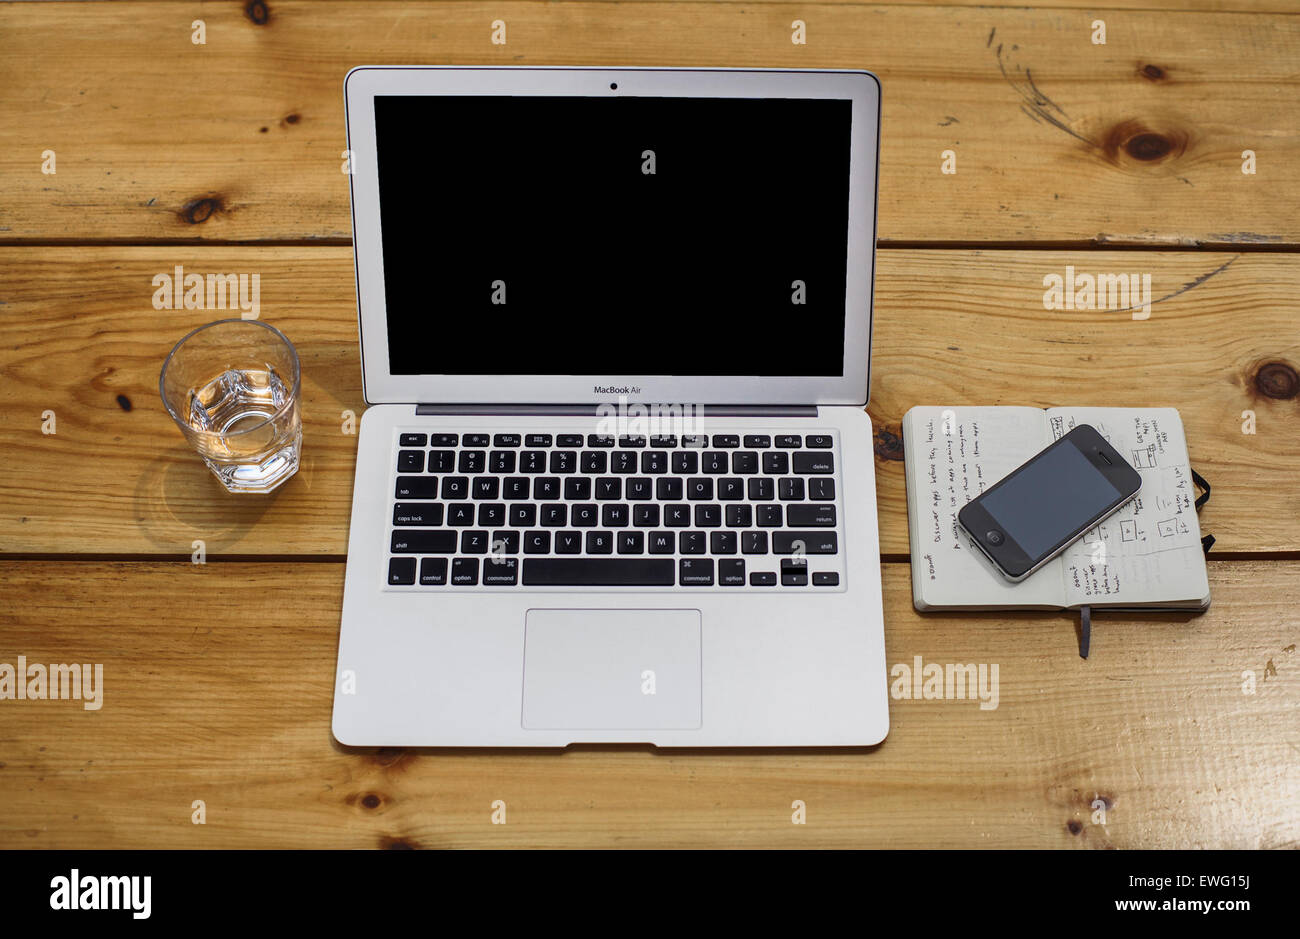 MacBook Air Bodegón Imagen De Stock